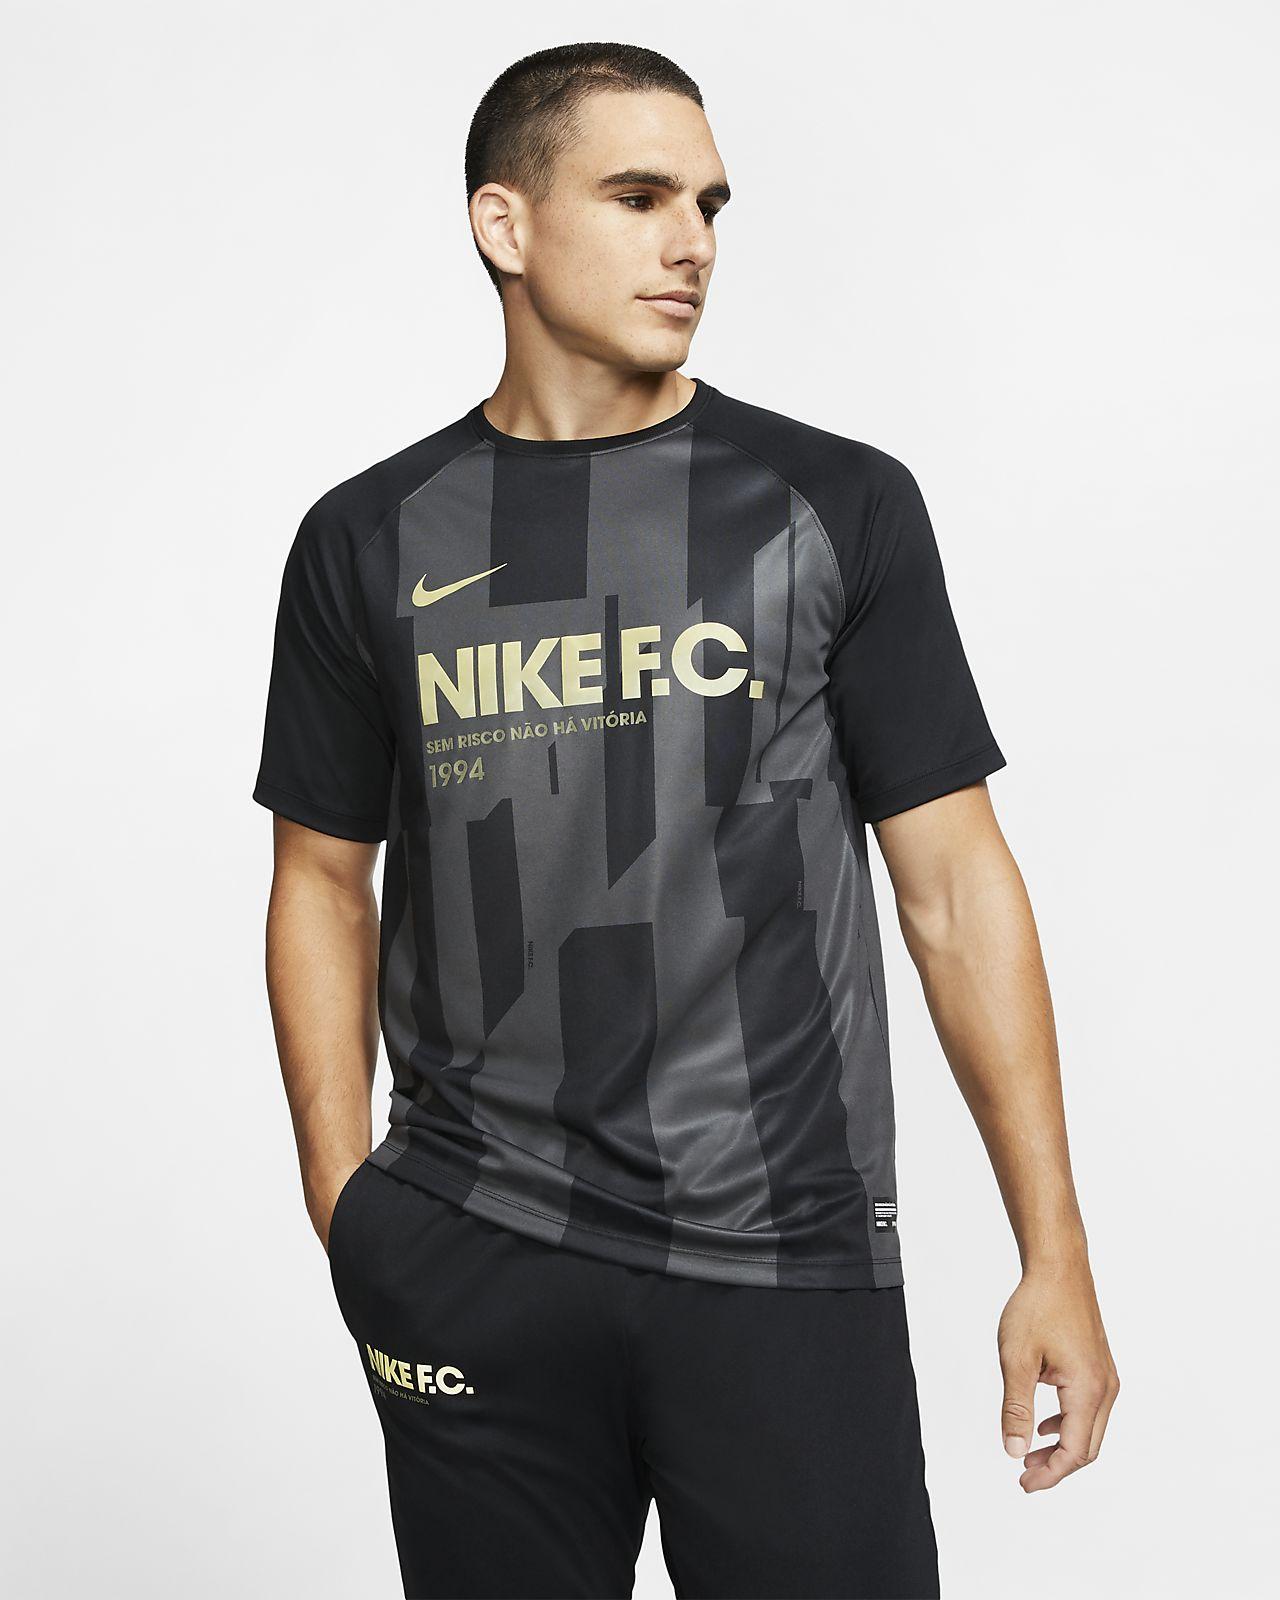 Kortärmad tröja Nike F.C. för män